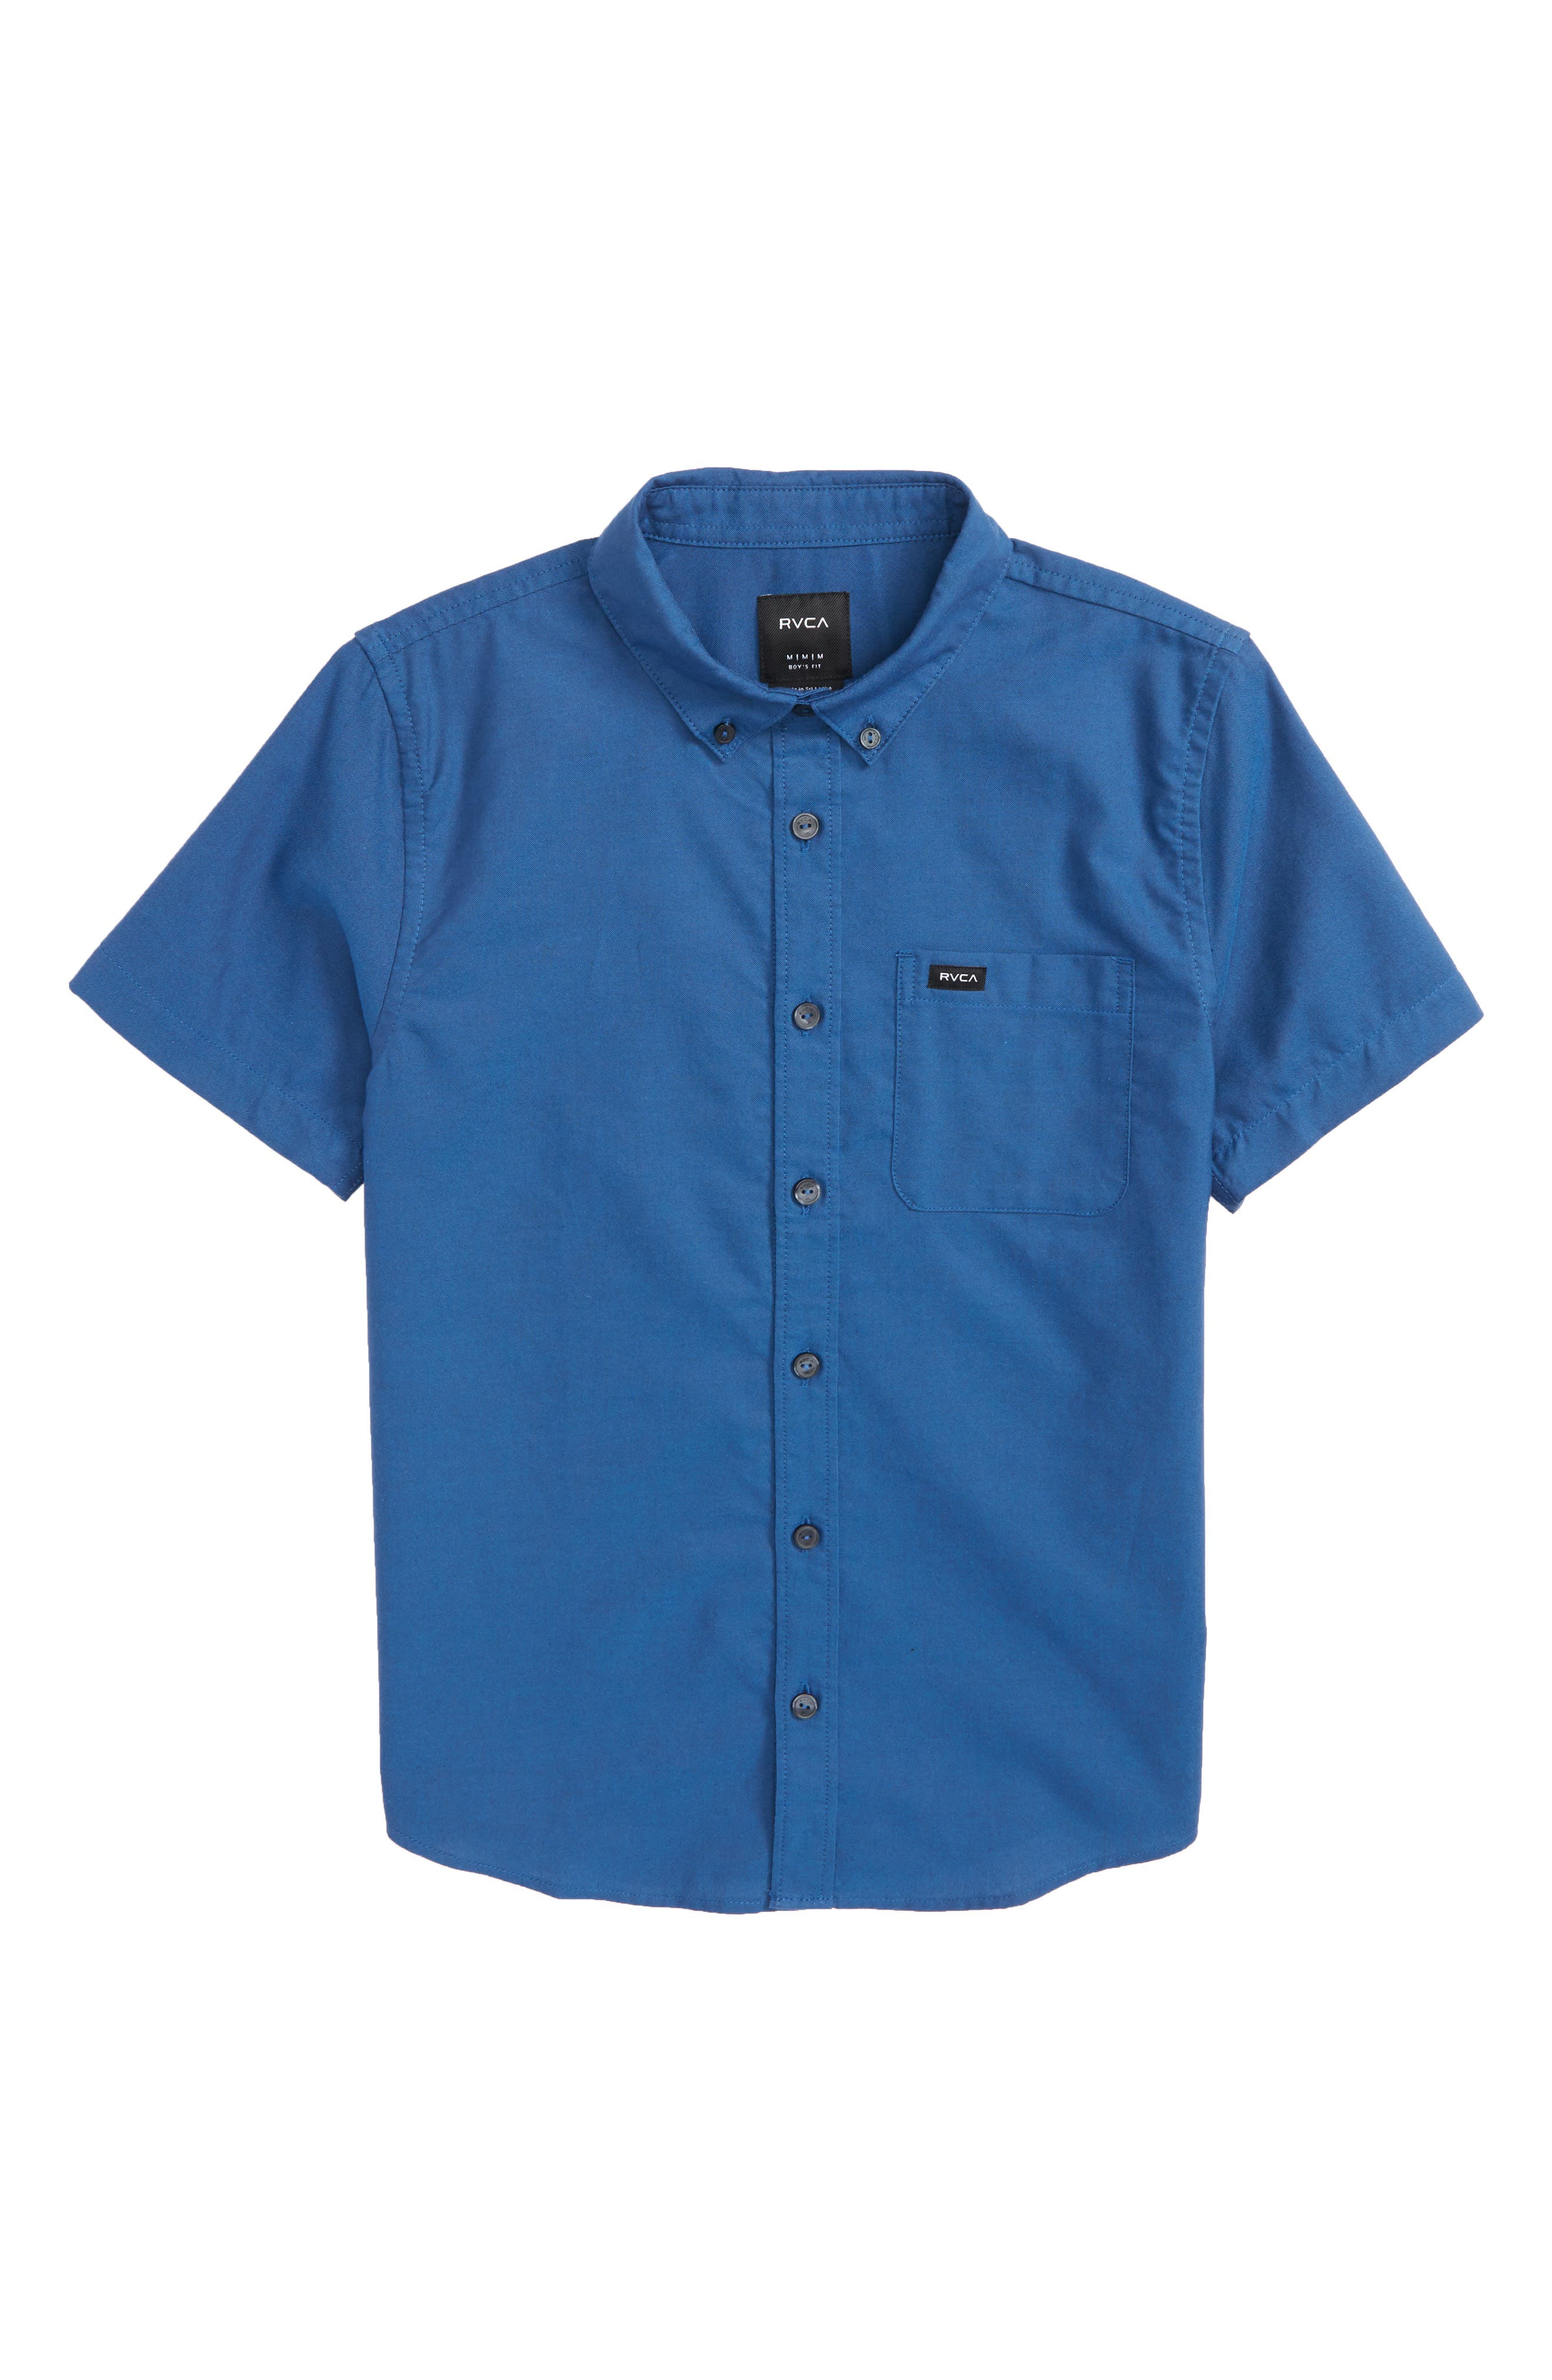 'That'll Do' Woven Shirt,                             Main thumbnail 6, color,